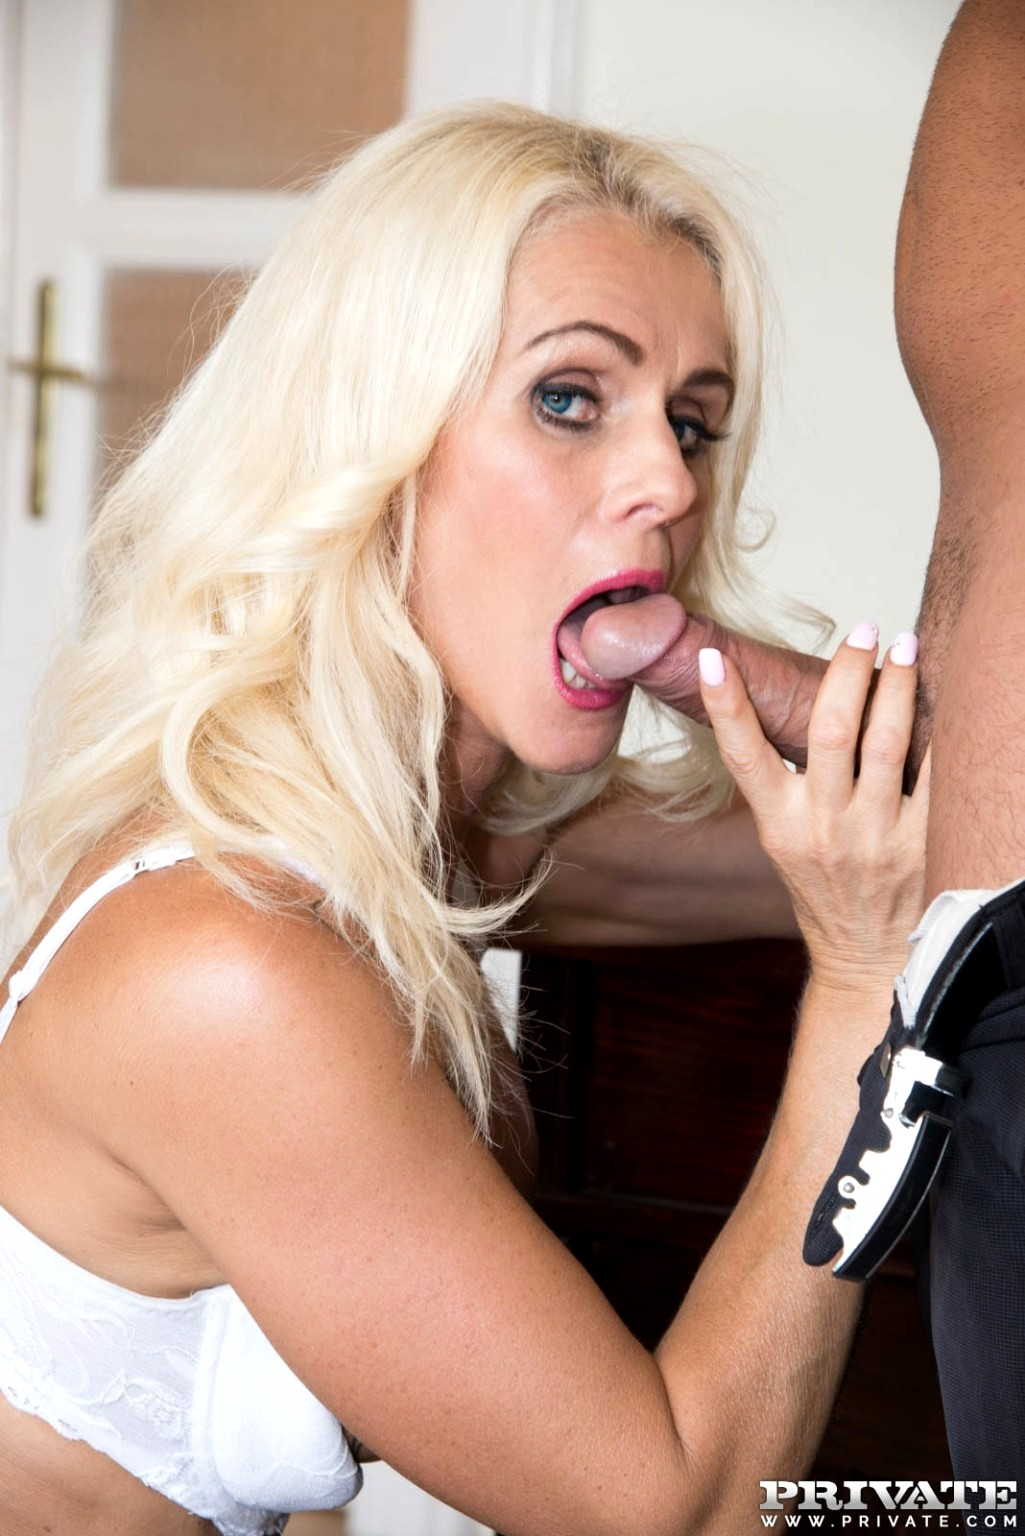 Hot milf secretary porn